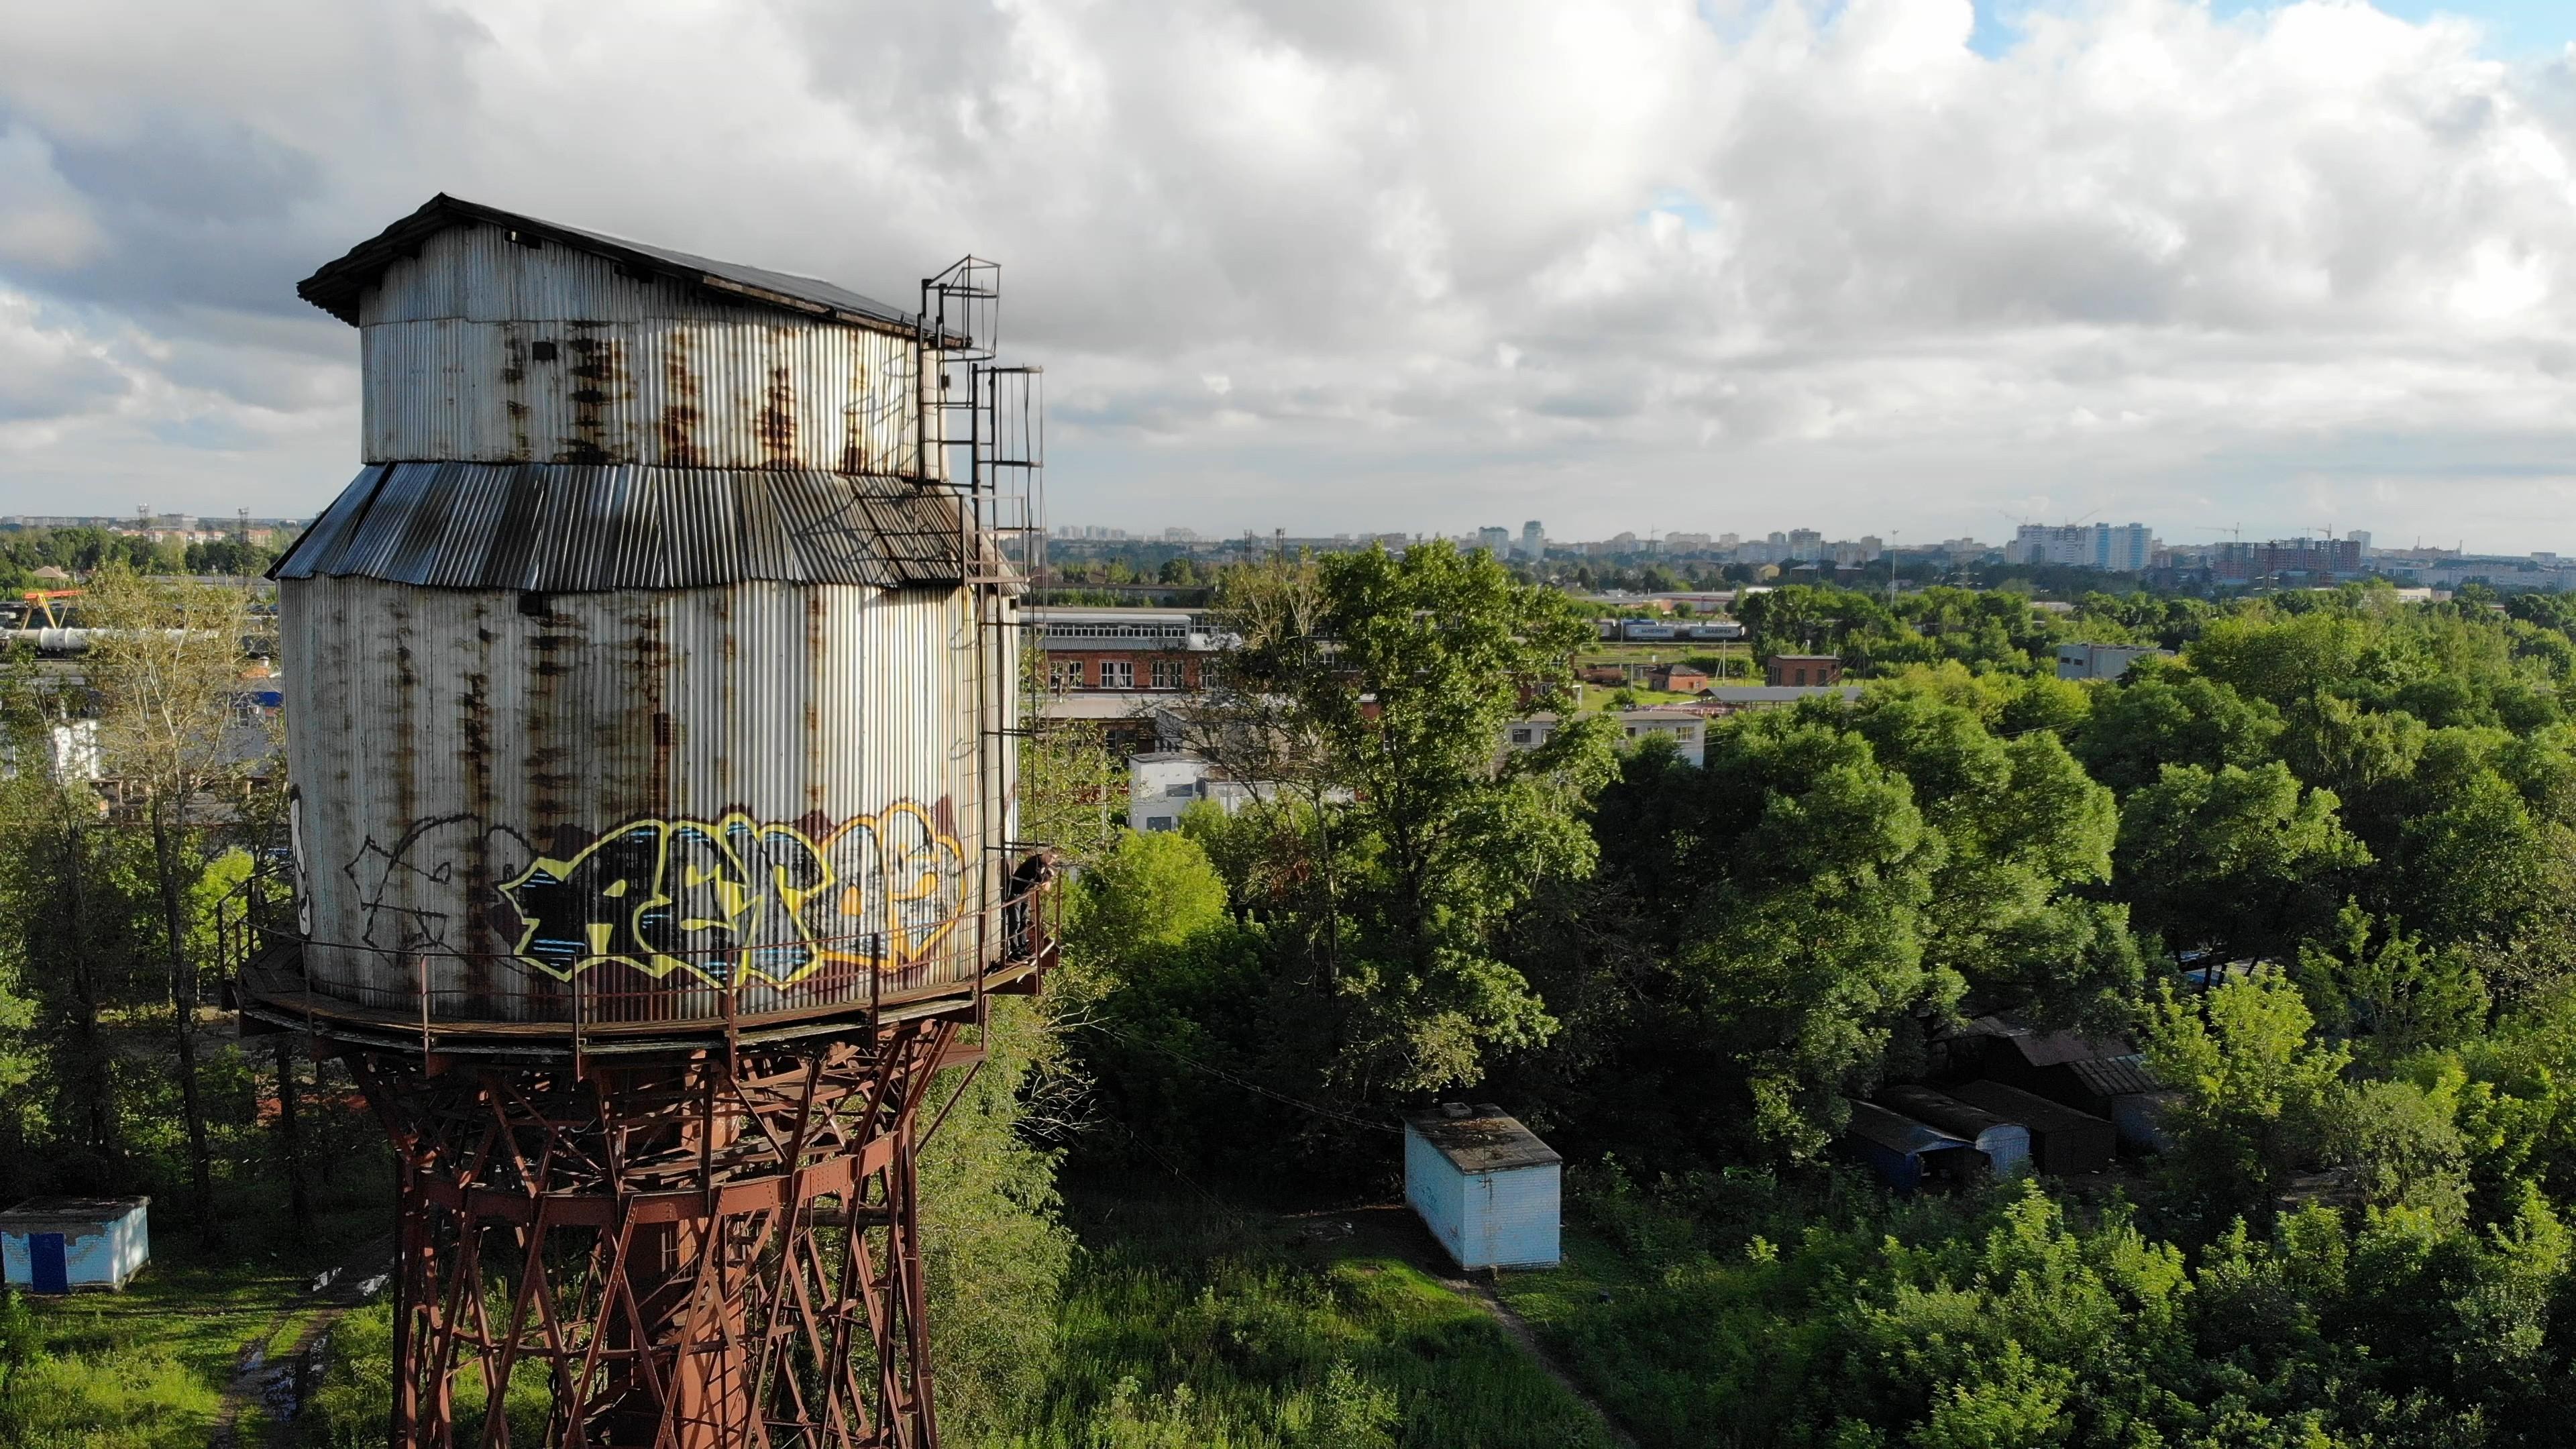 Abandoned Place wallpaper photo hd